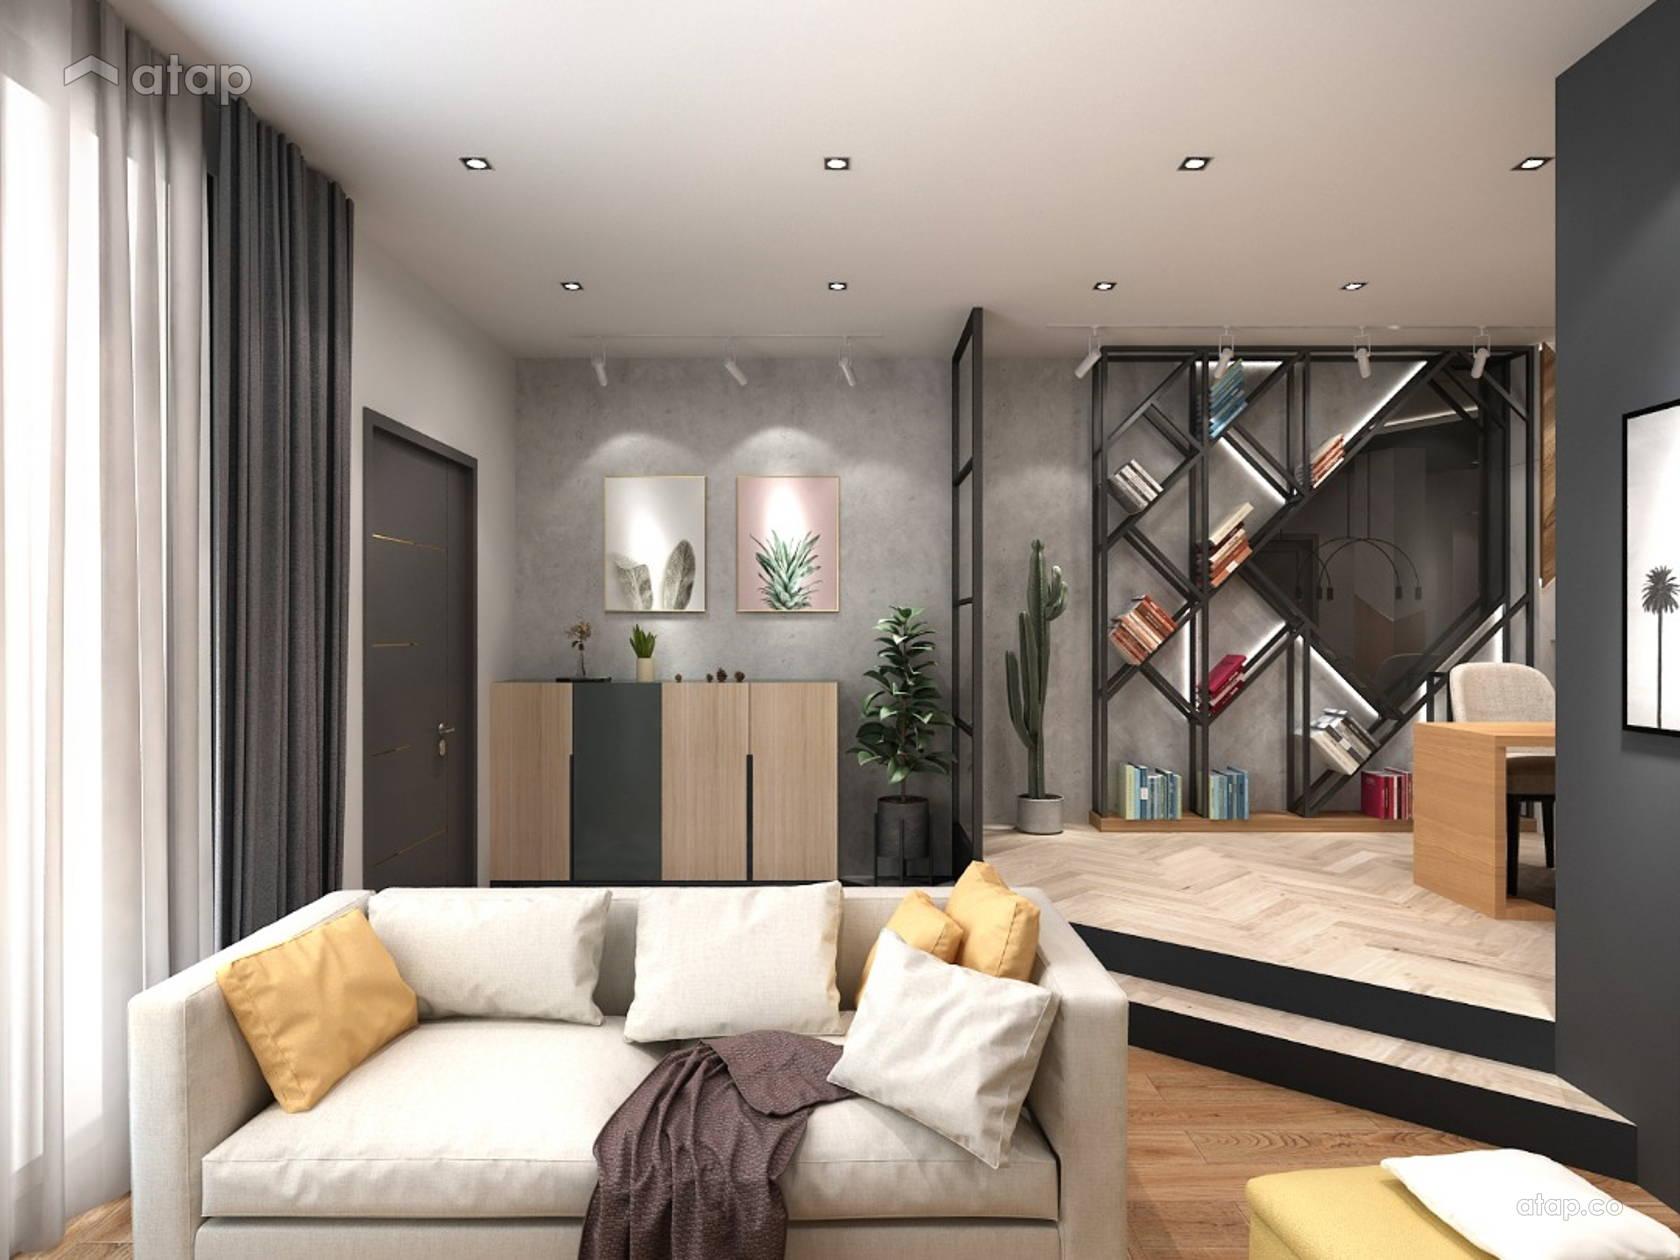 Classic Contemporary Family Room Living Room Terrace Design Ideas Photos Malaysia Atap Co